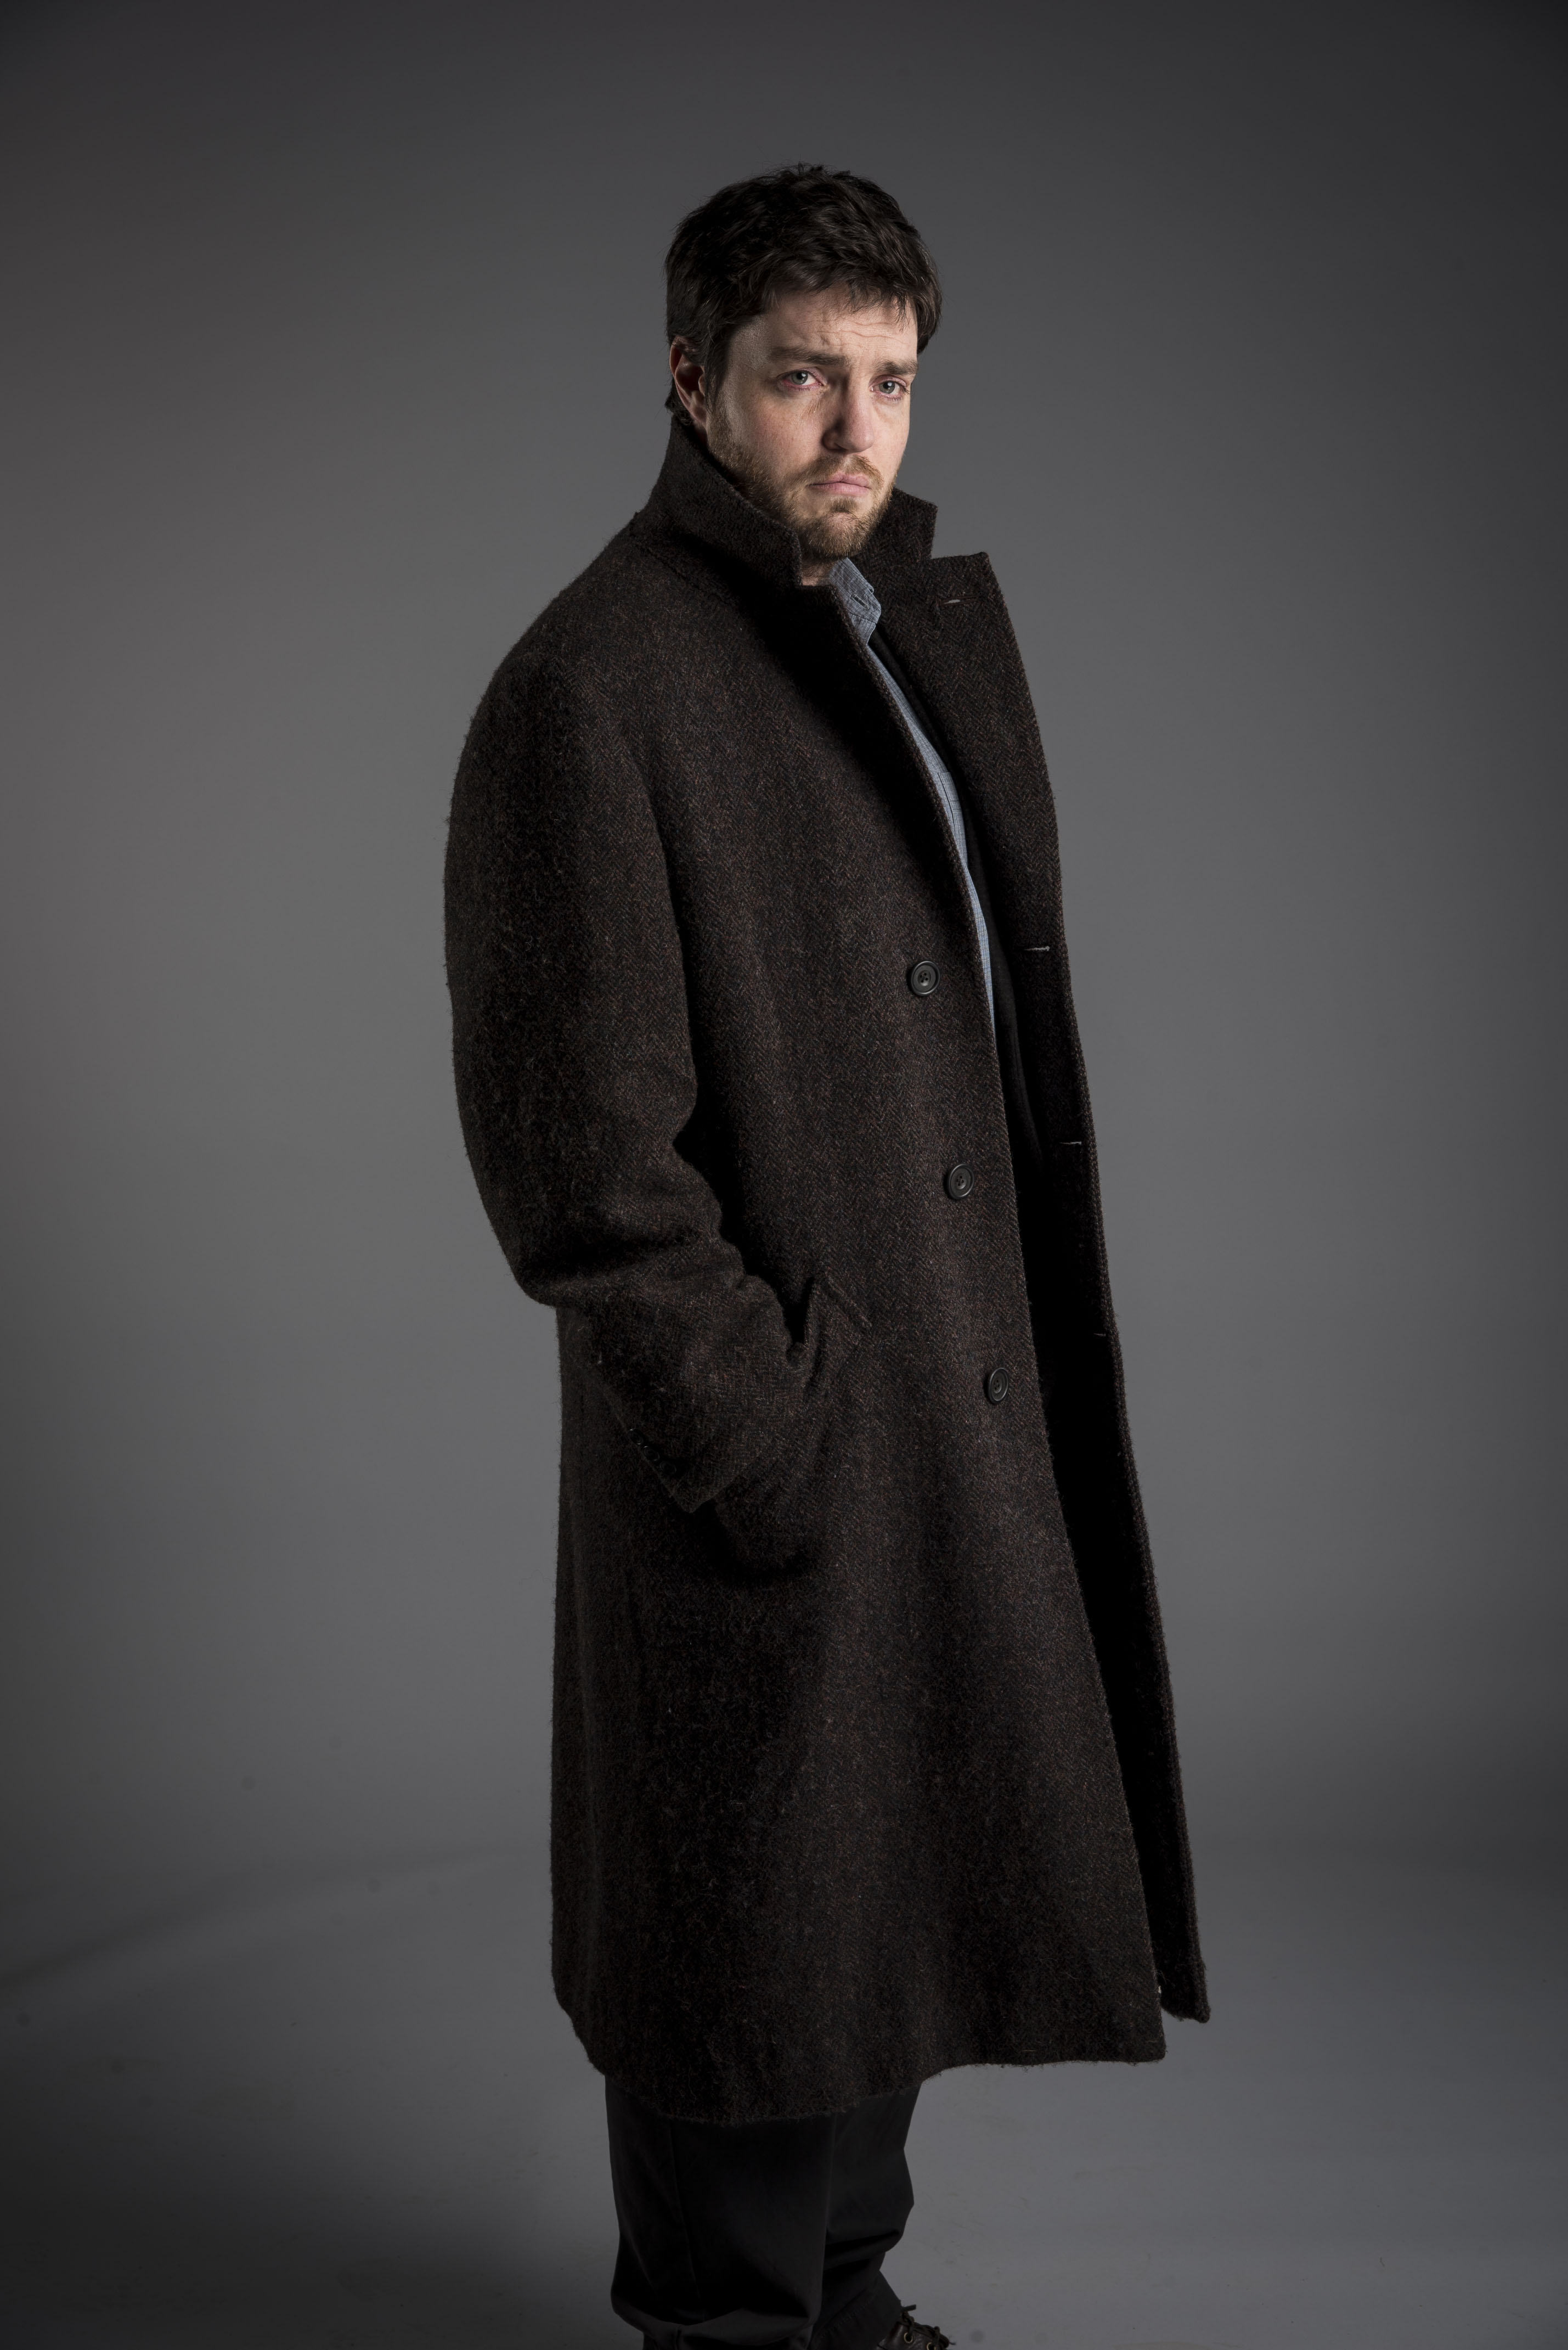 Tom Burke as Cormoran Strike (BBC, EH)